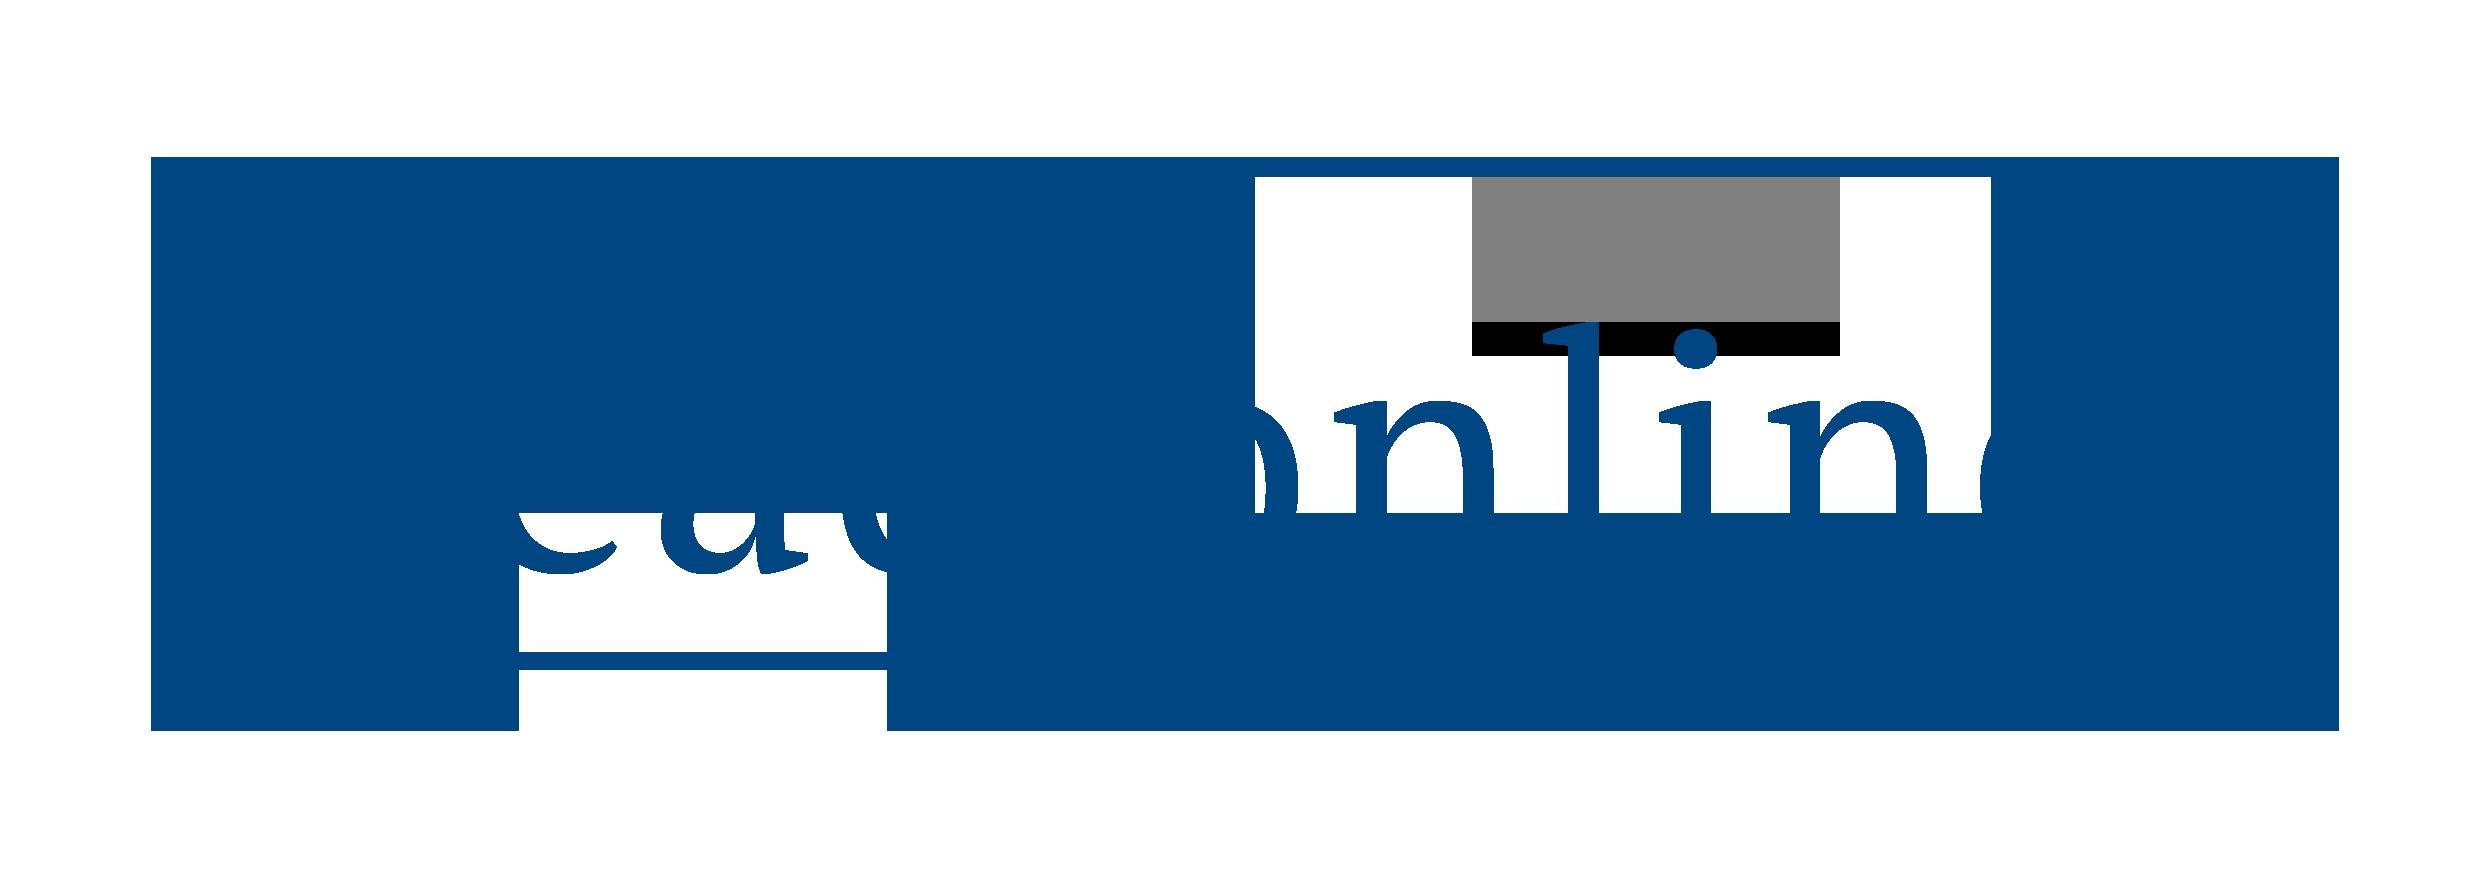 lead-online.de - Webdesign Agentur in München